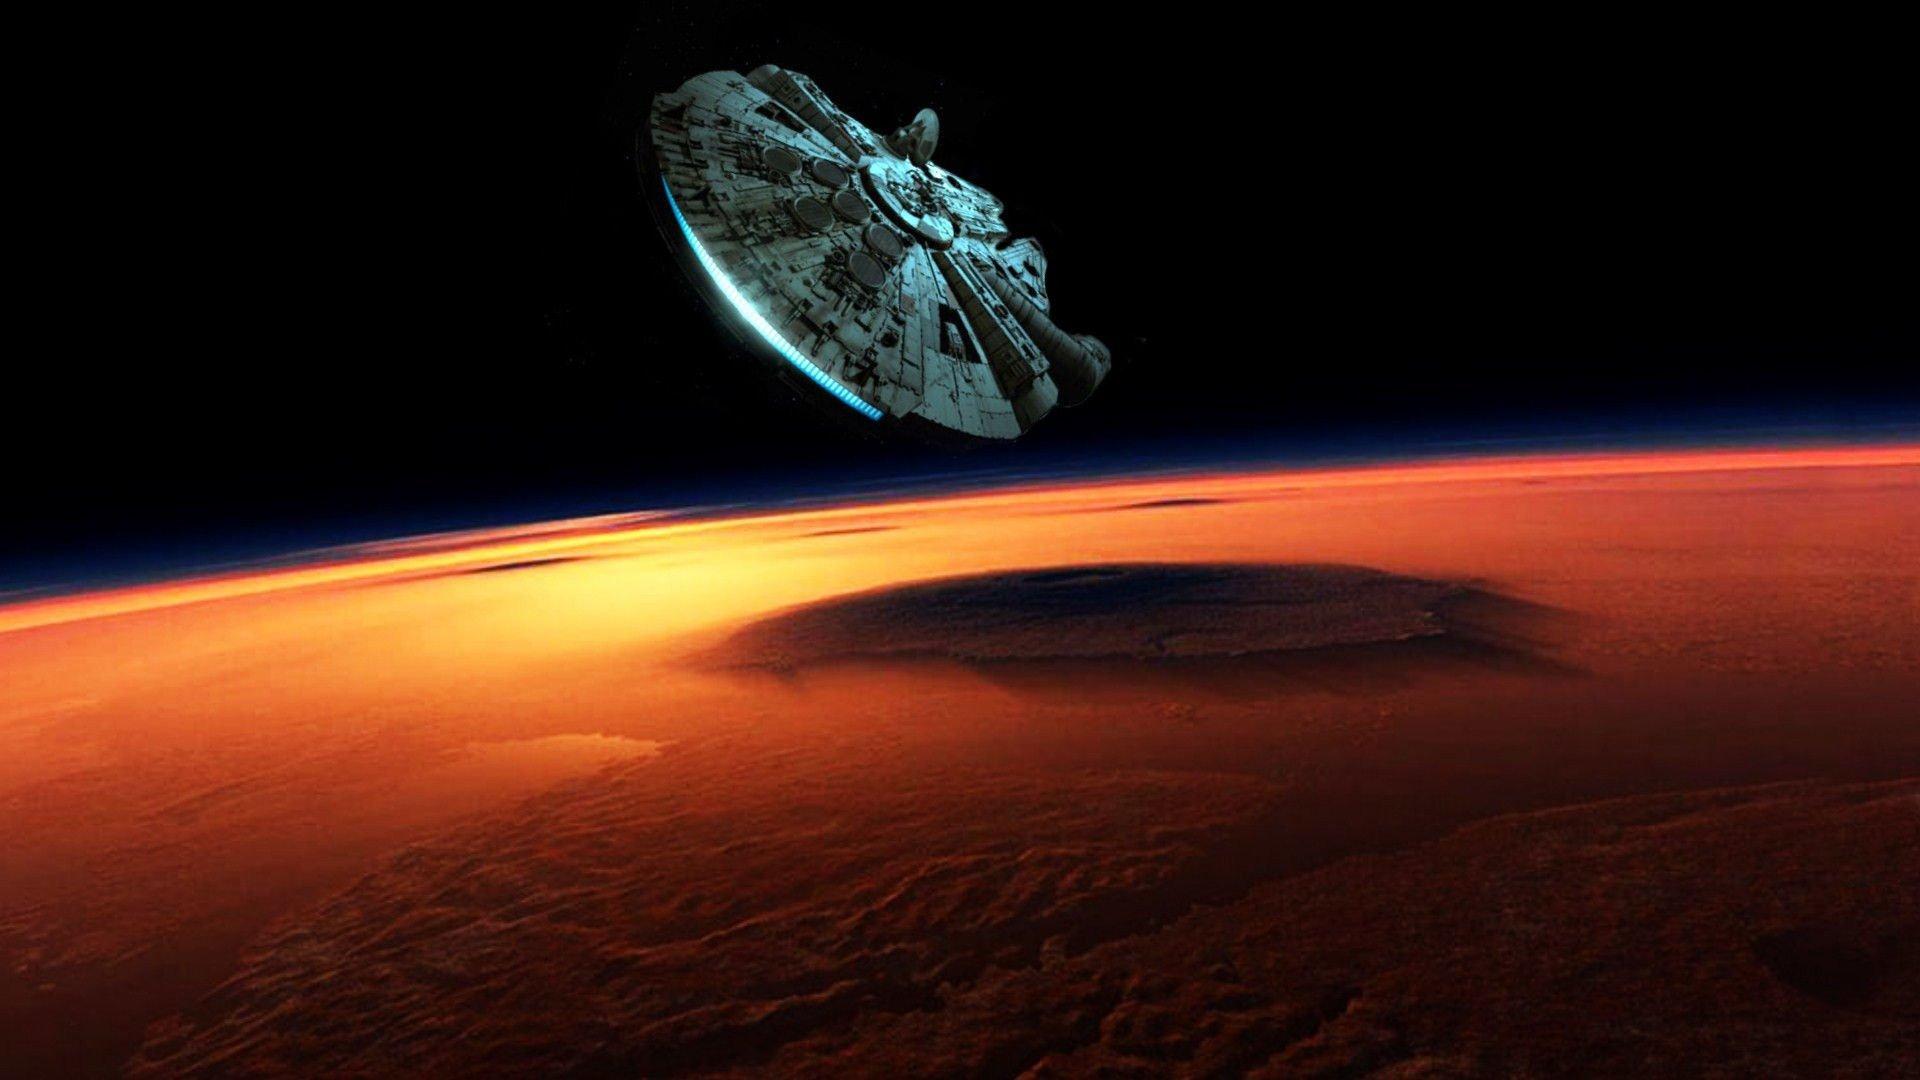 Free Download Fond Dcran Haute Dfinition Star Wars 7 The